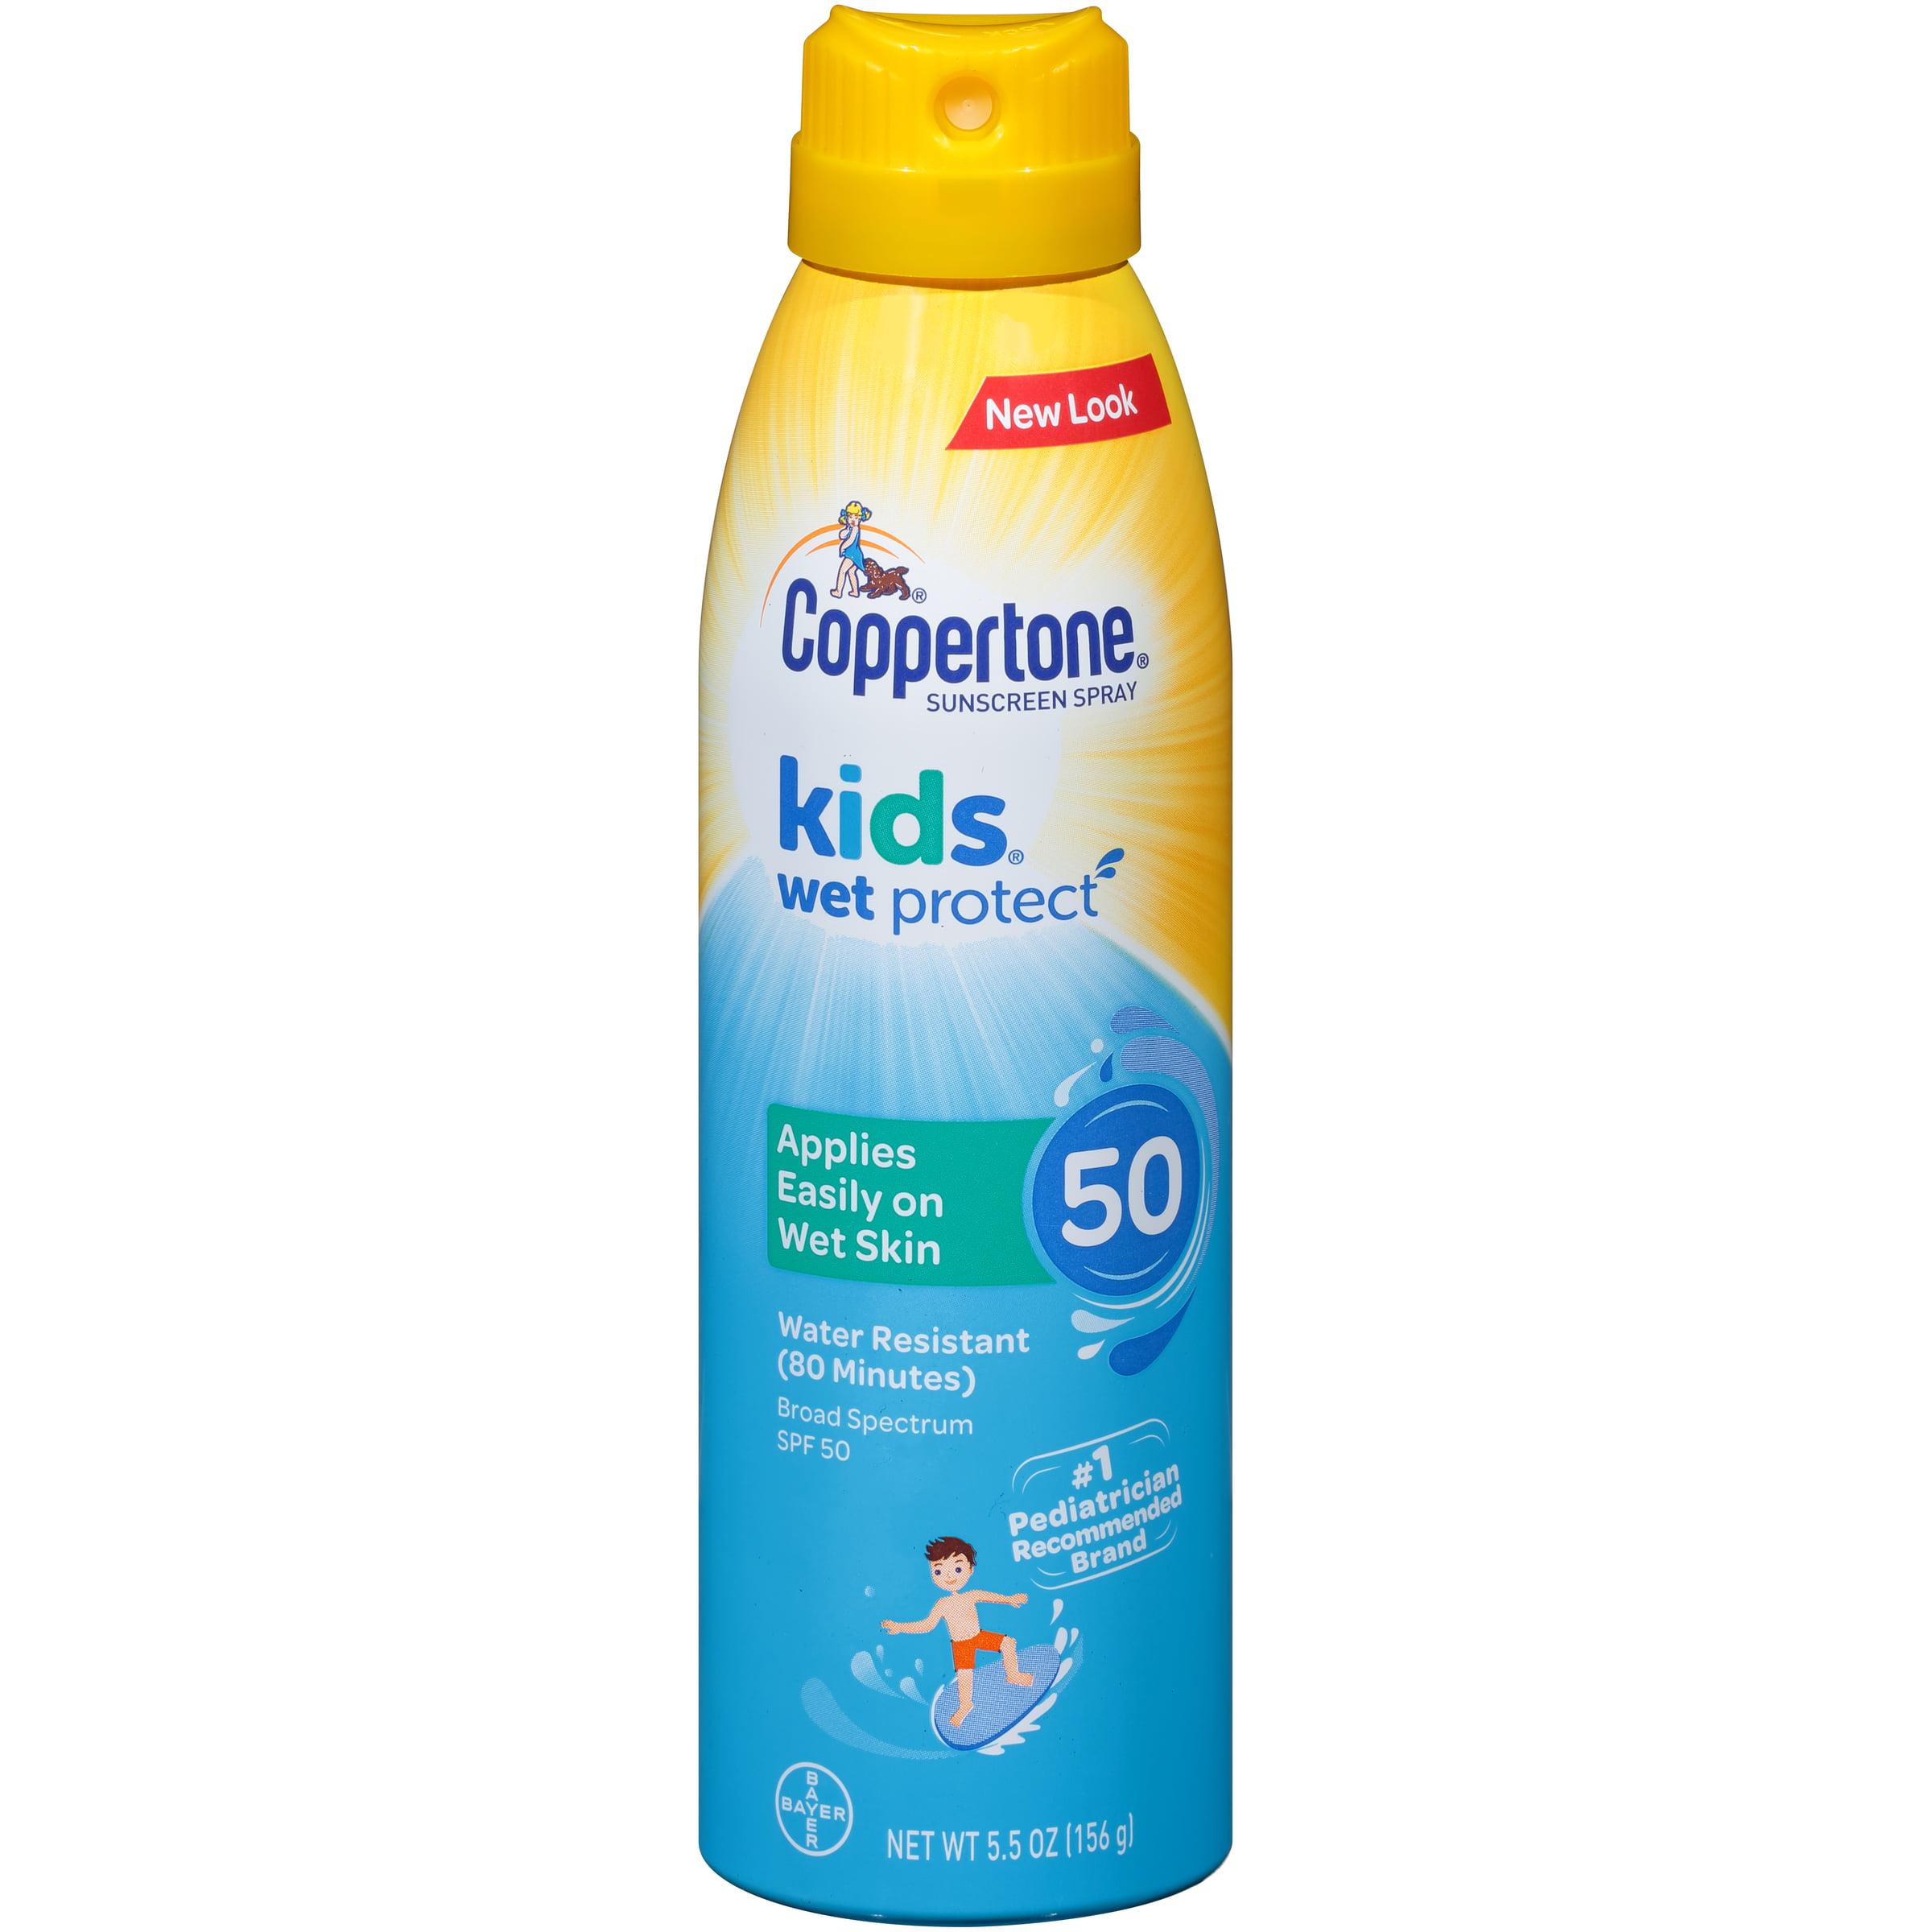 Coppertone Kids Sunscreen Wet Protect Spray SPF 50, 5.5 oz